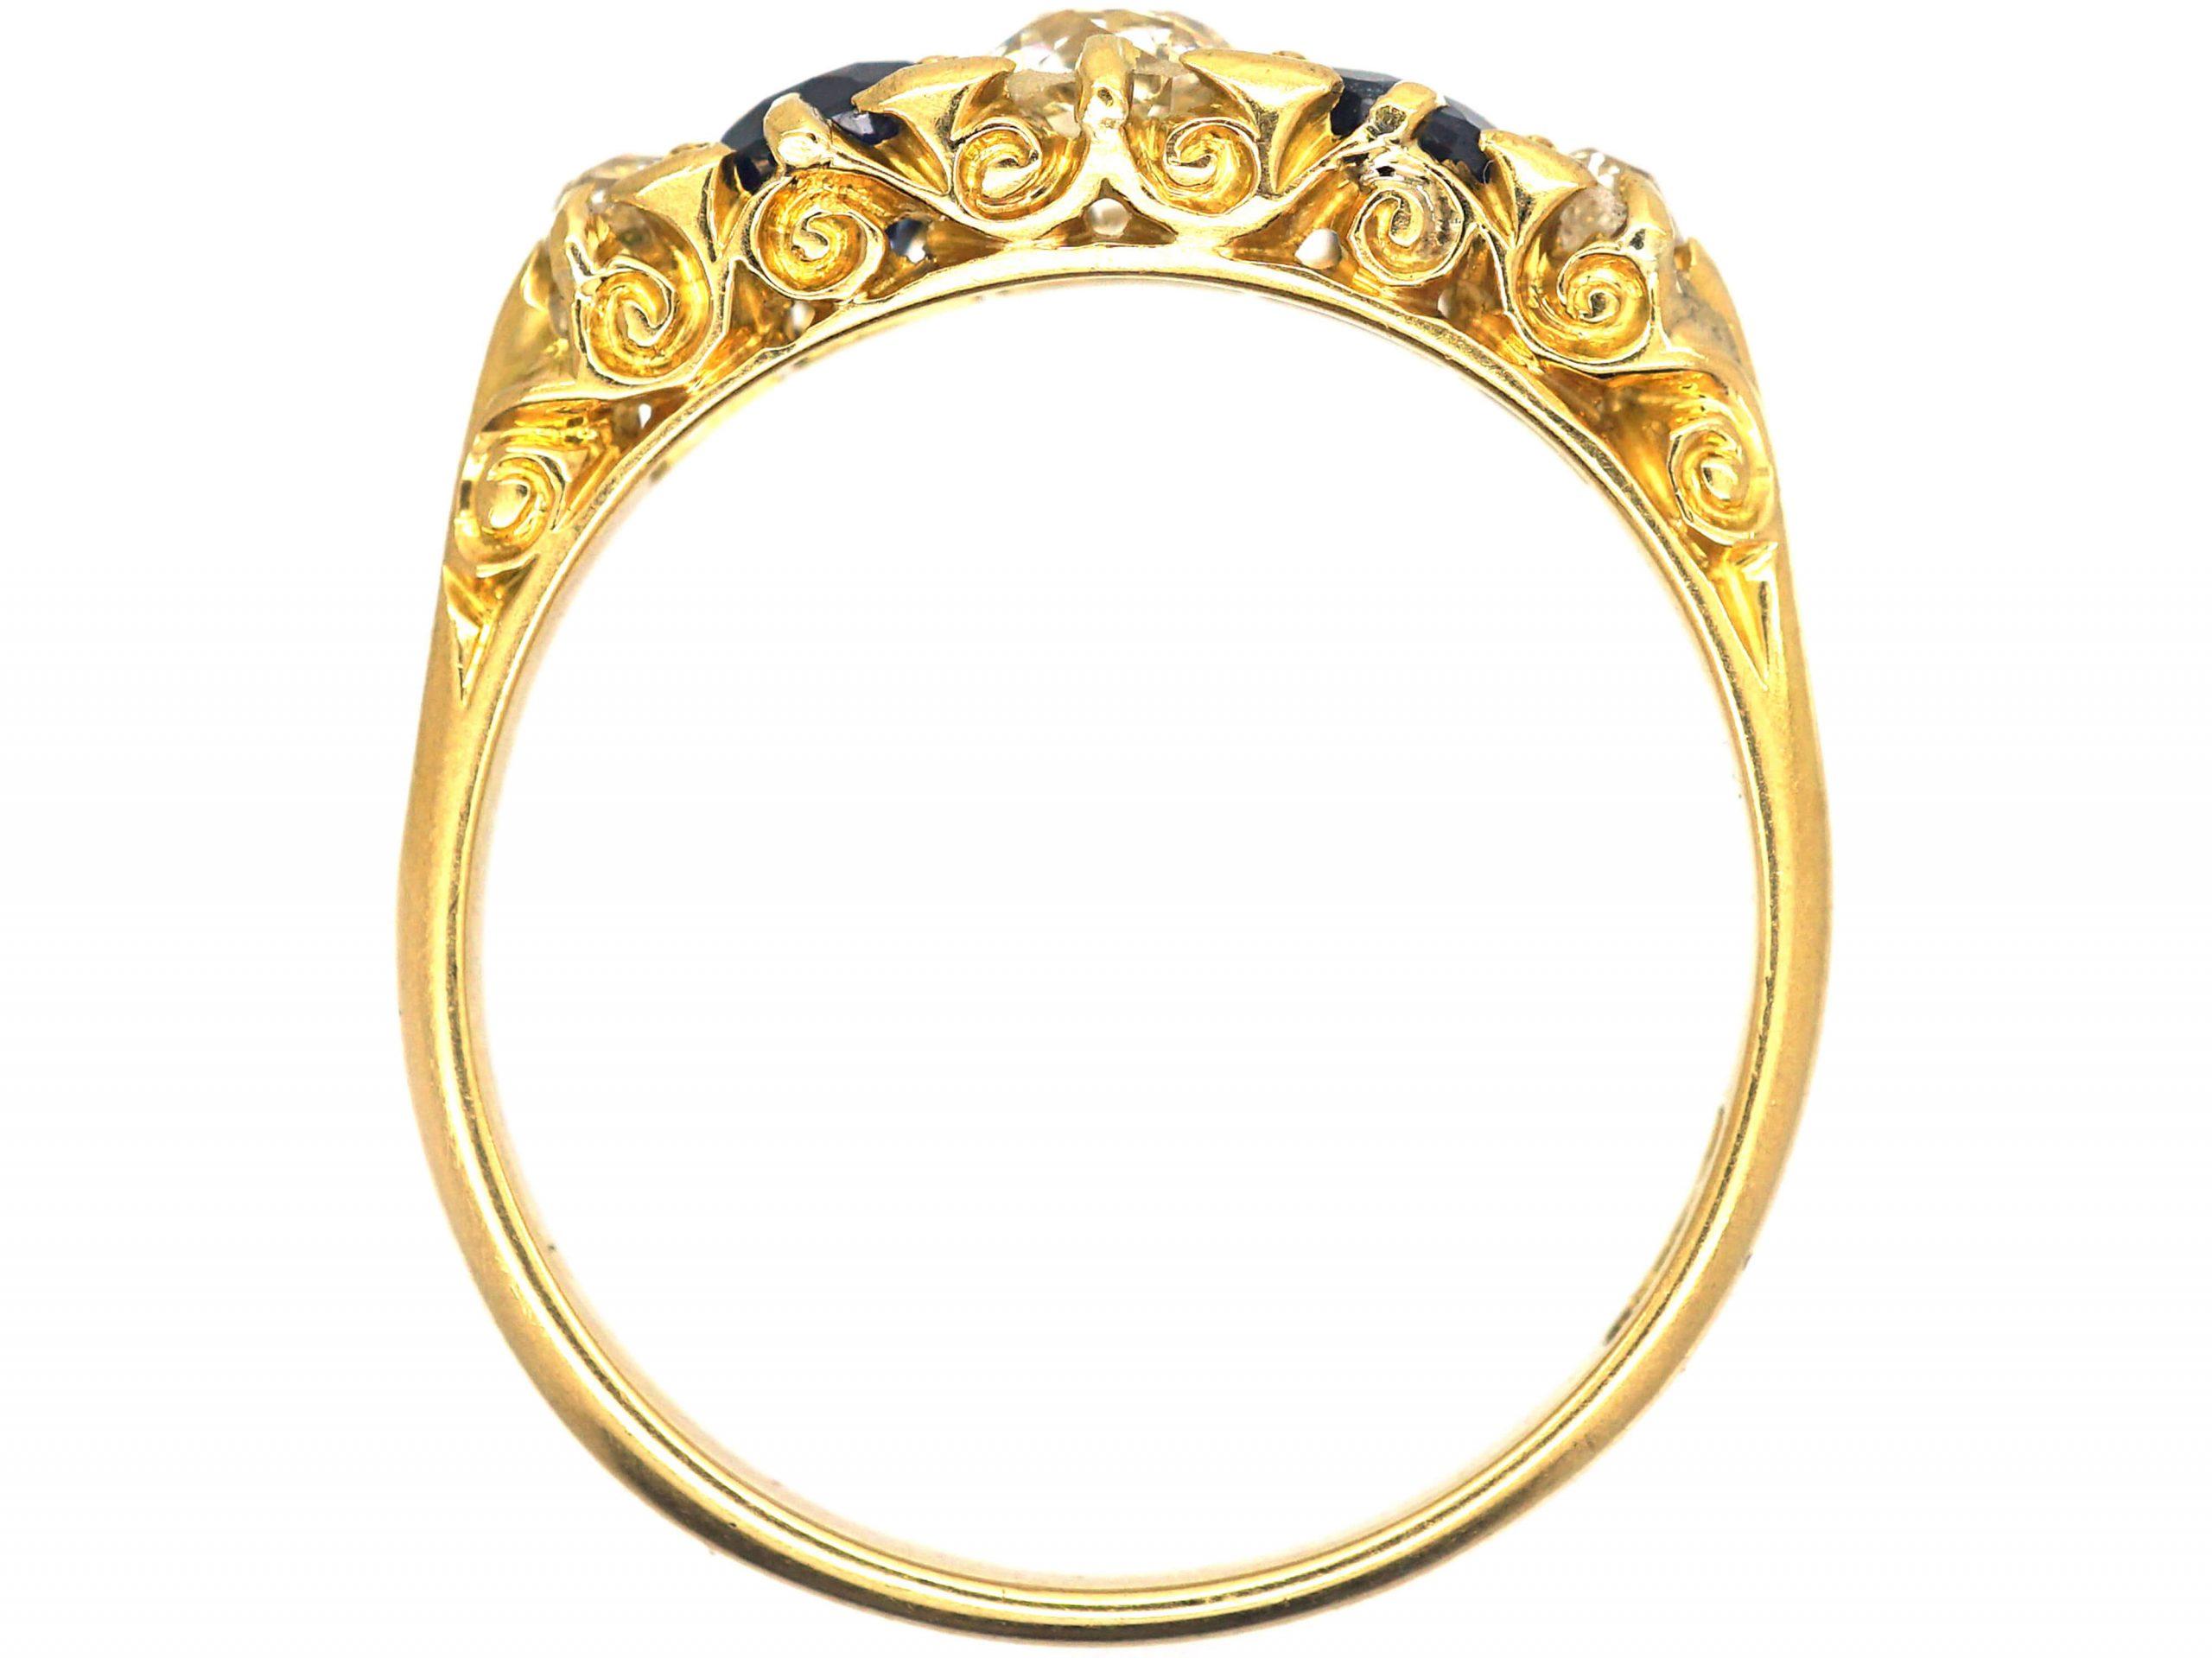 Edwardian 18ct Gold, Sapphire & Diamond Five Stone Ring